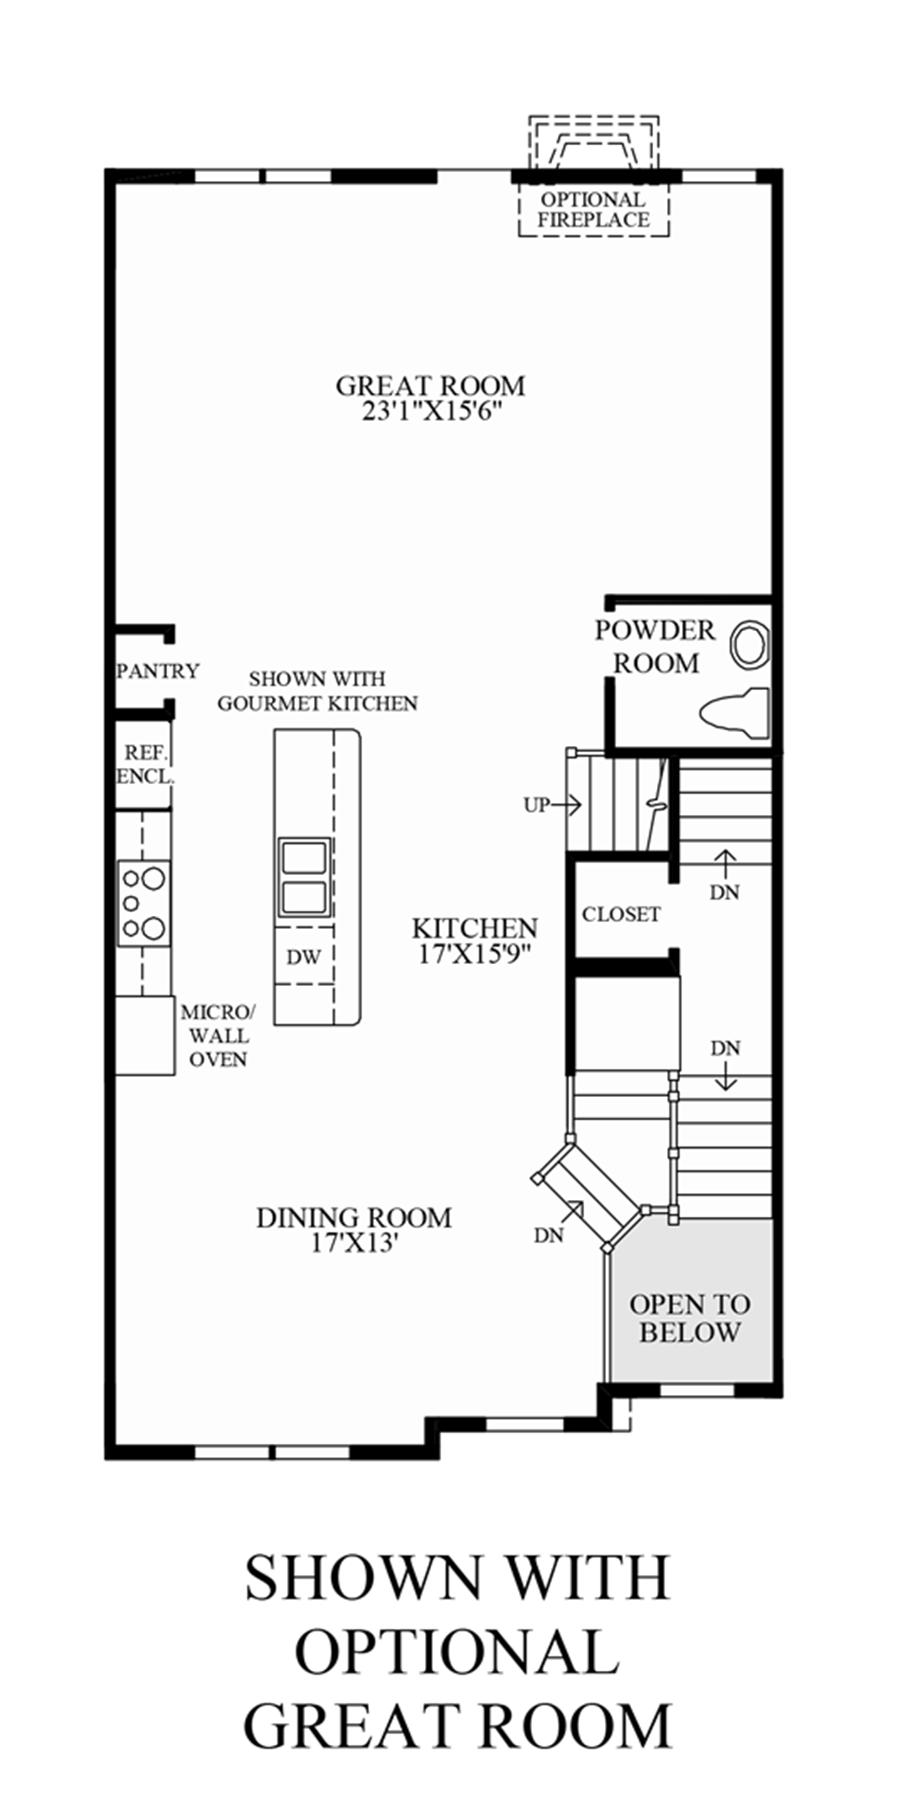 Optional Great Room (Lower Level Entry) Floor Plan